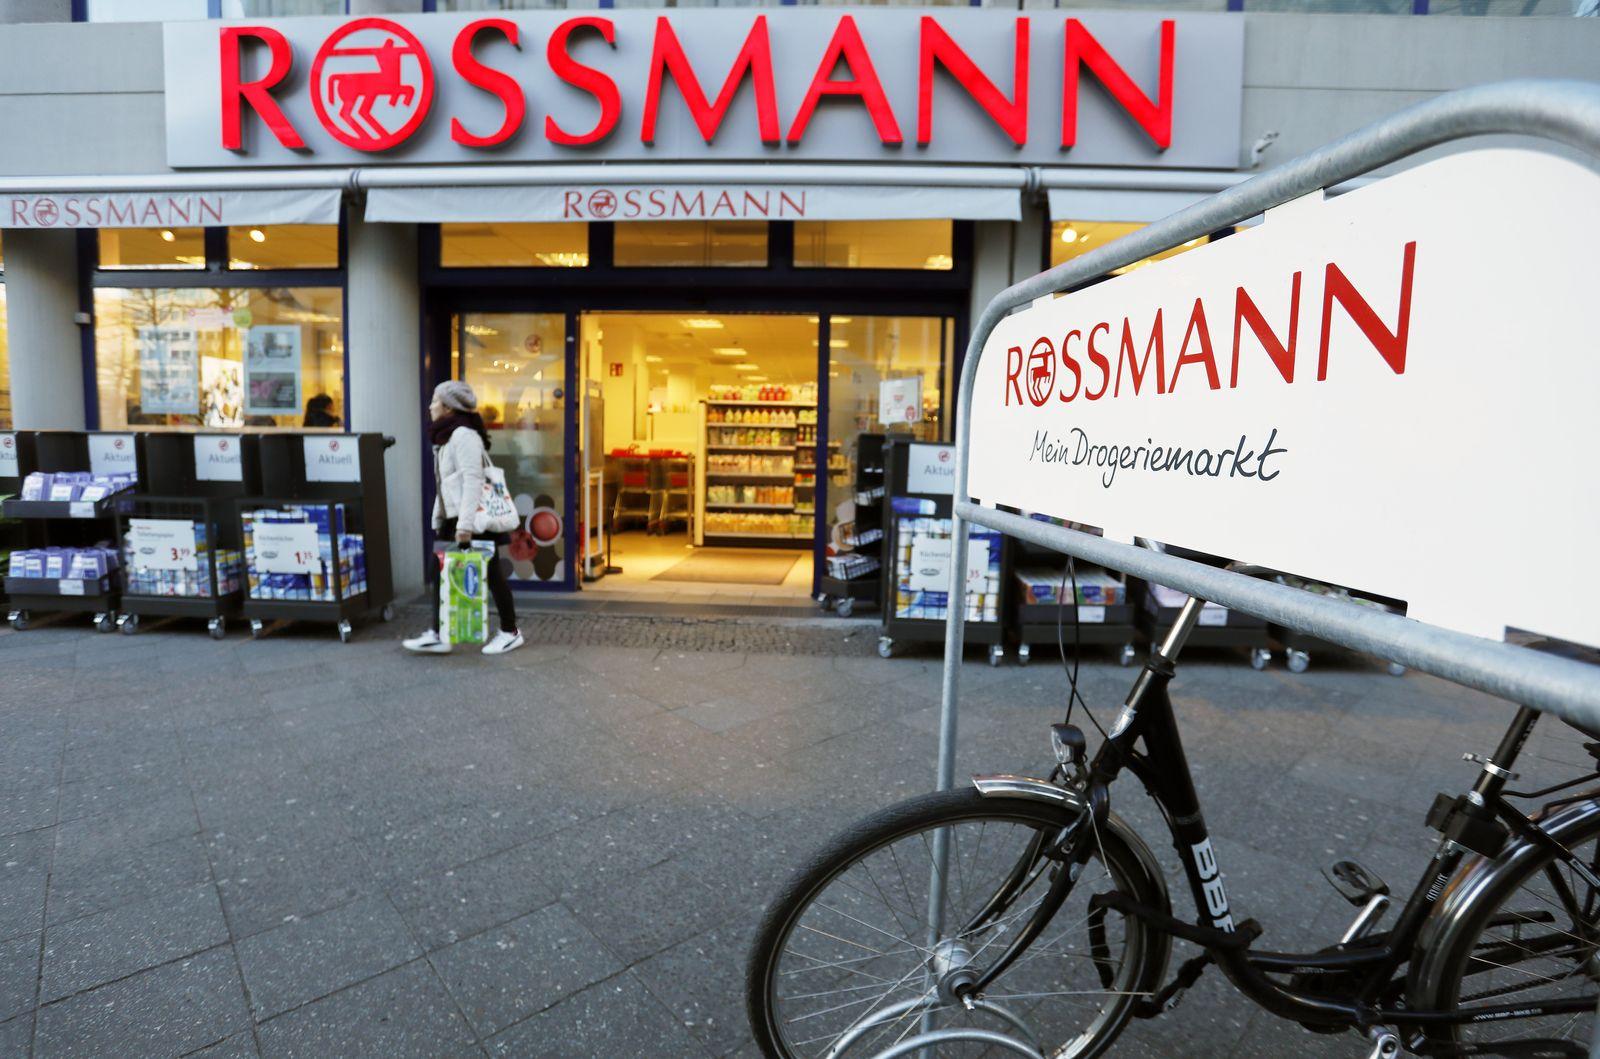 Rossmann / Rückrufaktion